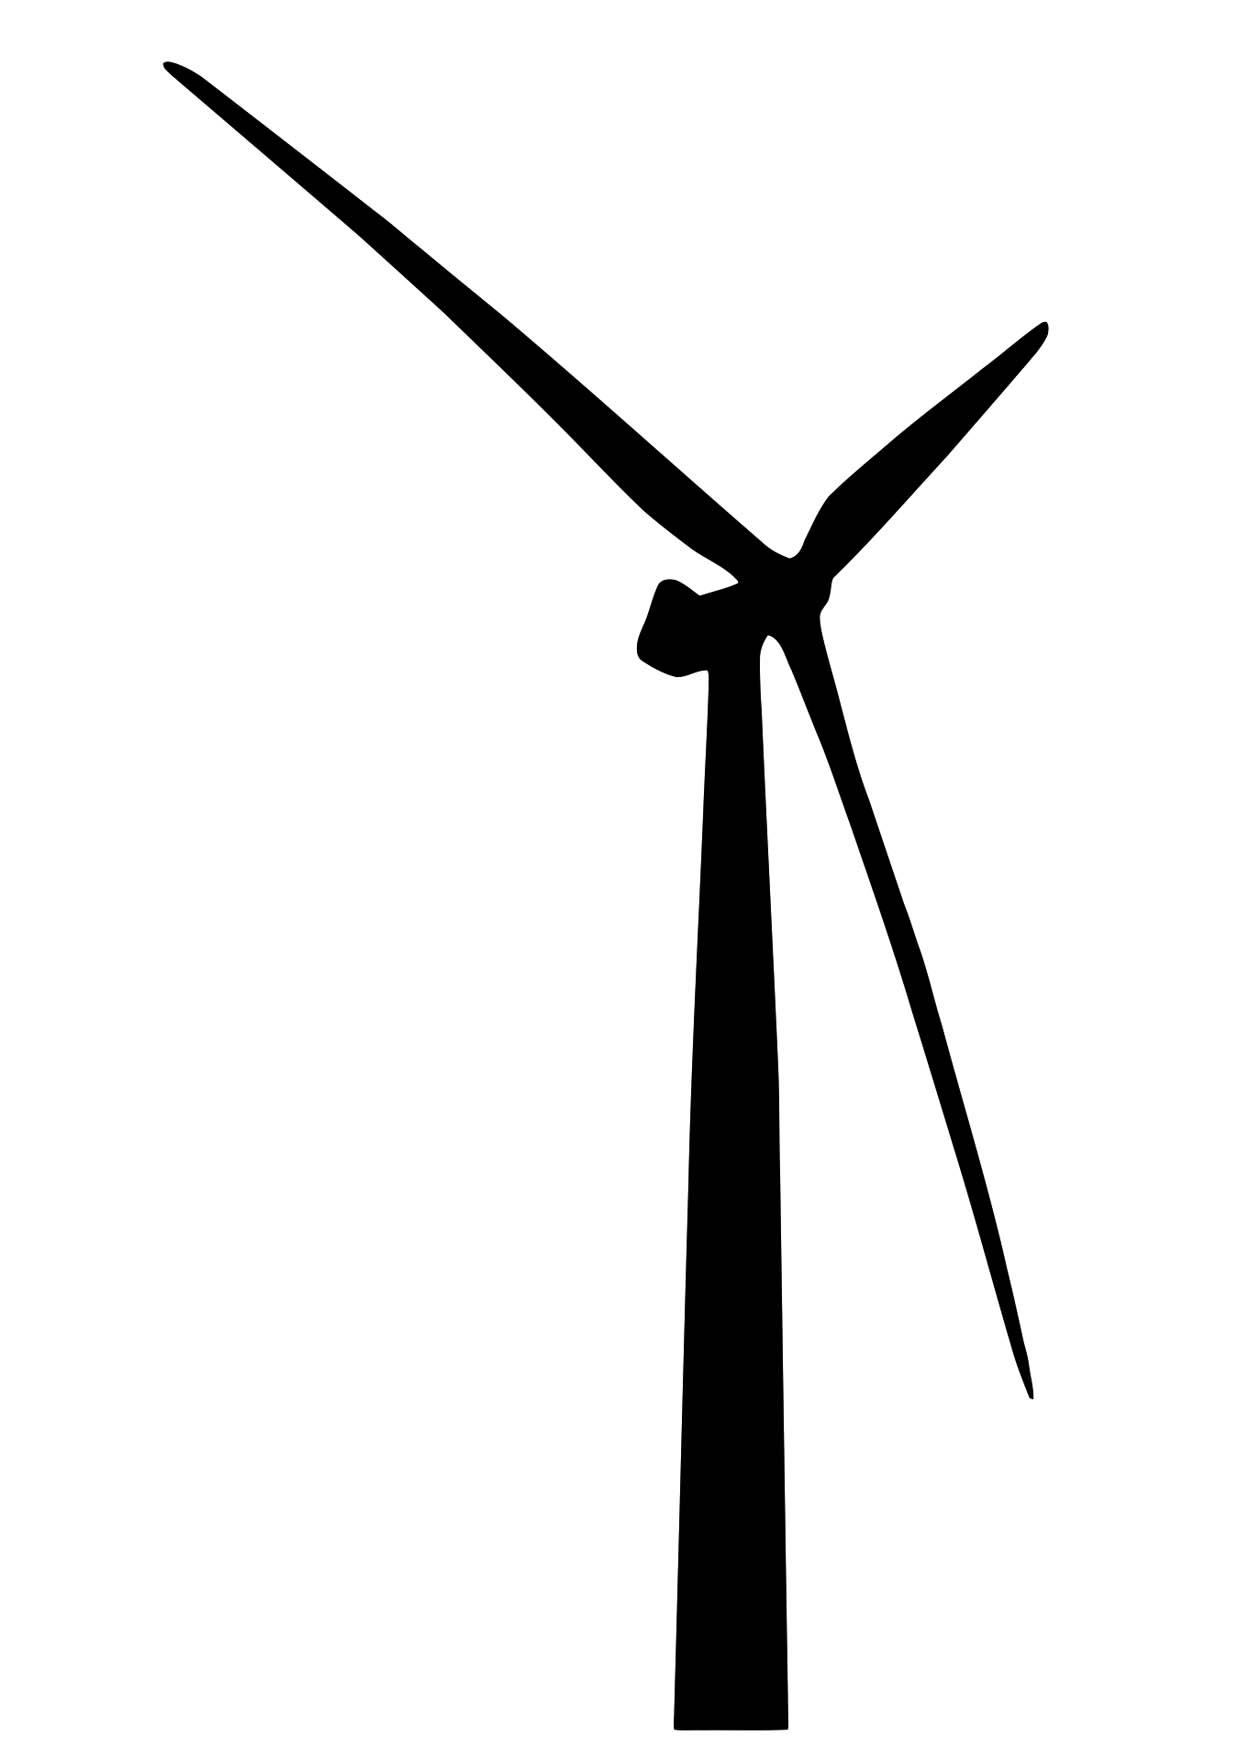 Dibujo Para Colorear Turbina De Viento Img 11442